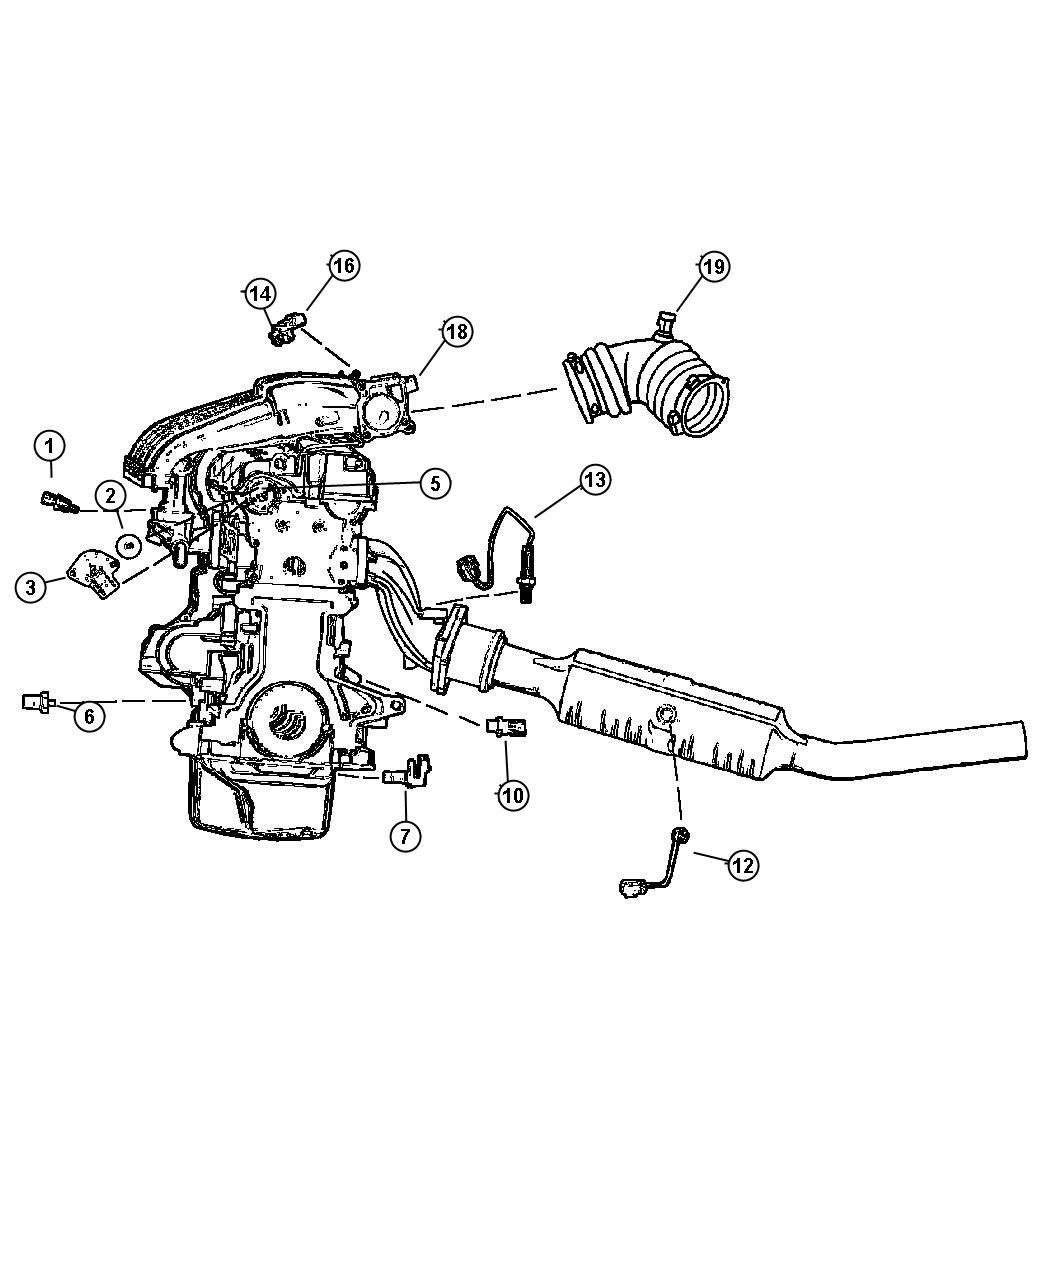 Dodge Stratus Sensor Map Engine Sensors Cooler